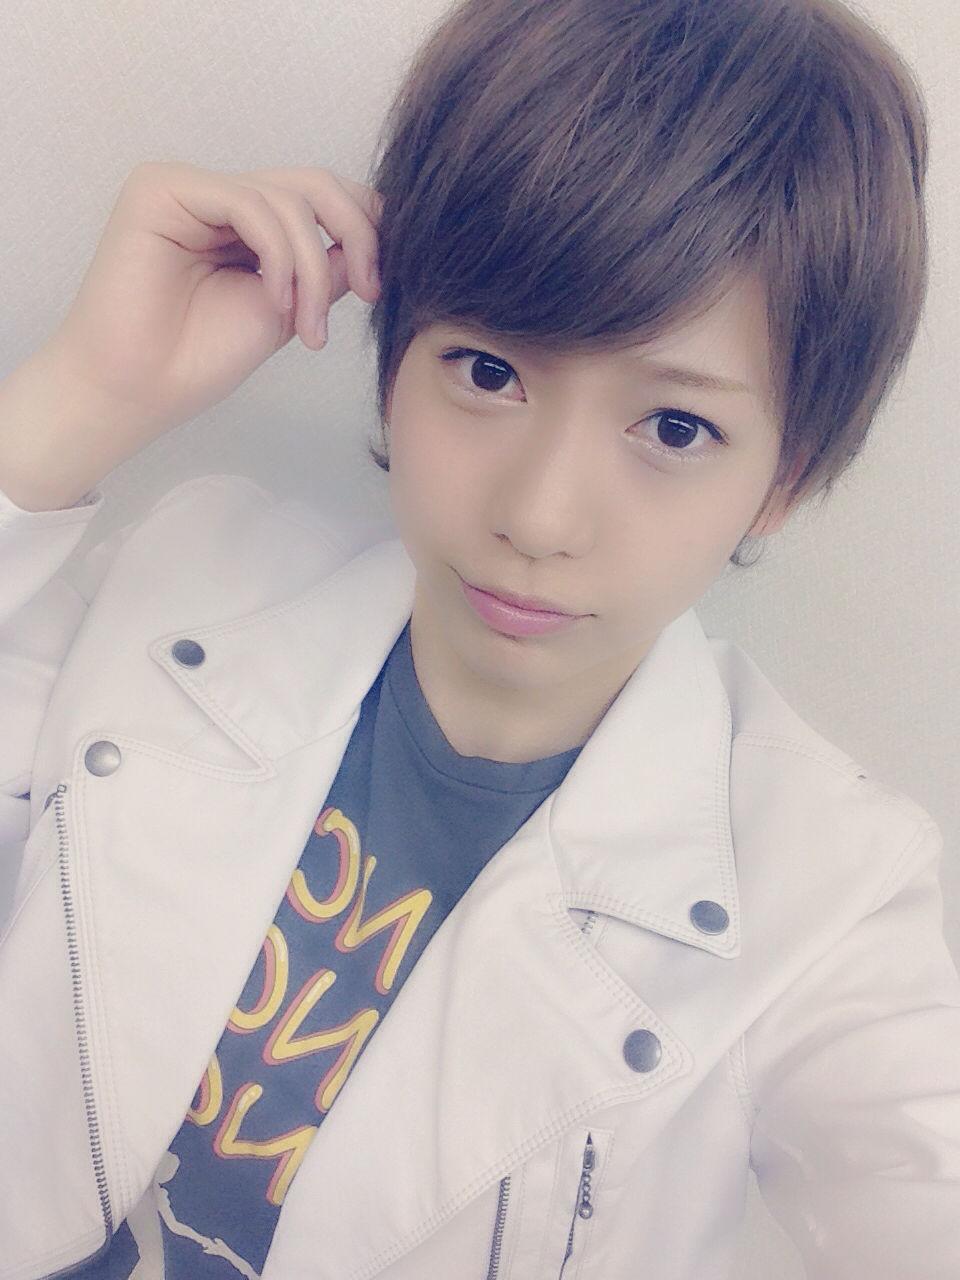 【AKB48】茂木忍(16) 男装姿を披露 「とんでもないイケメン」と話題に